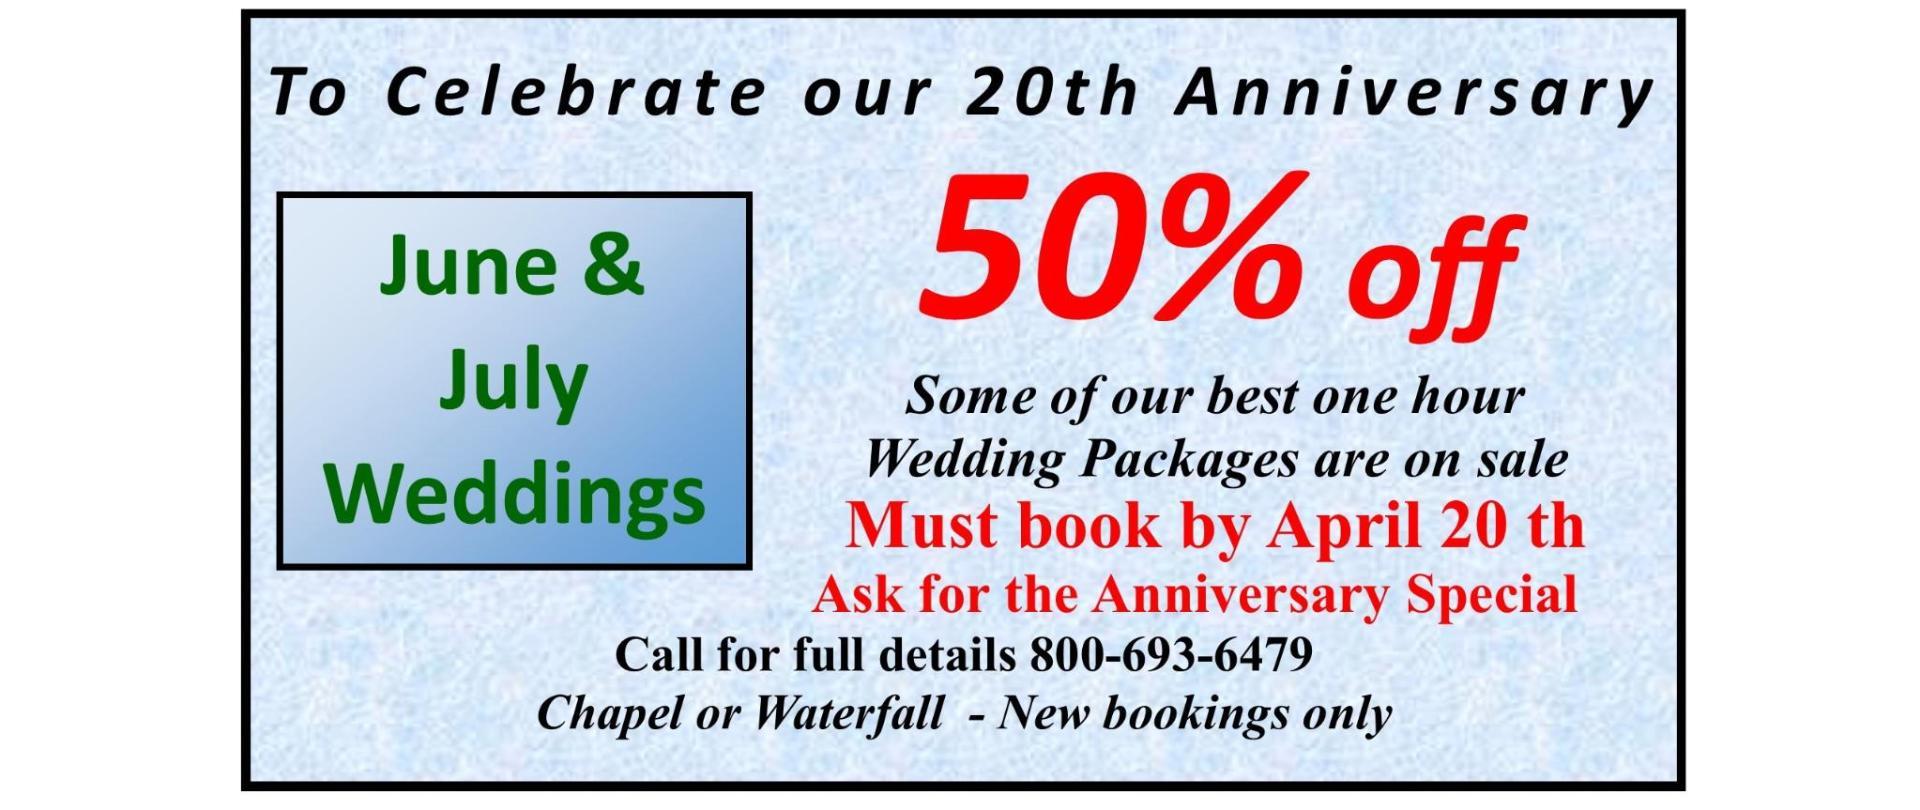 GWC 20 year anniversary coupon june july 2020.jpg